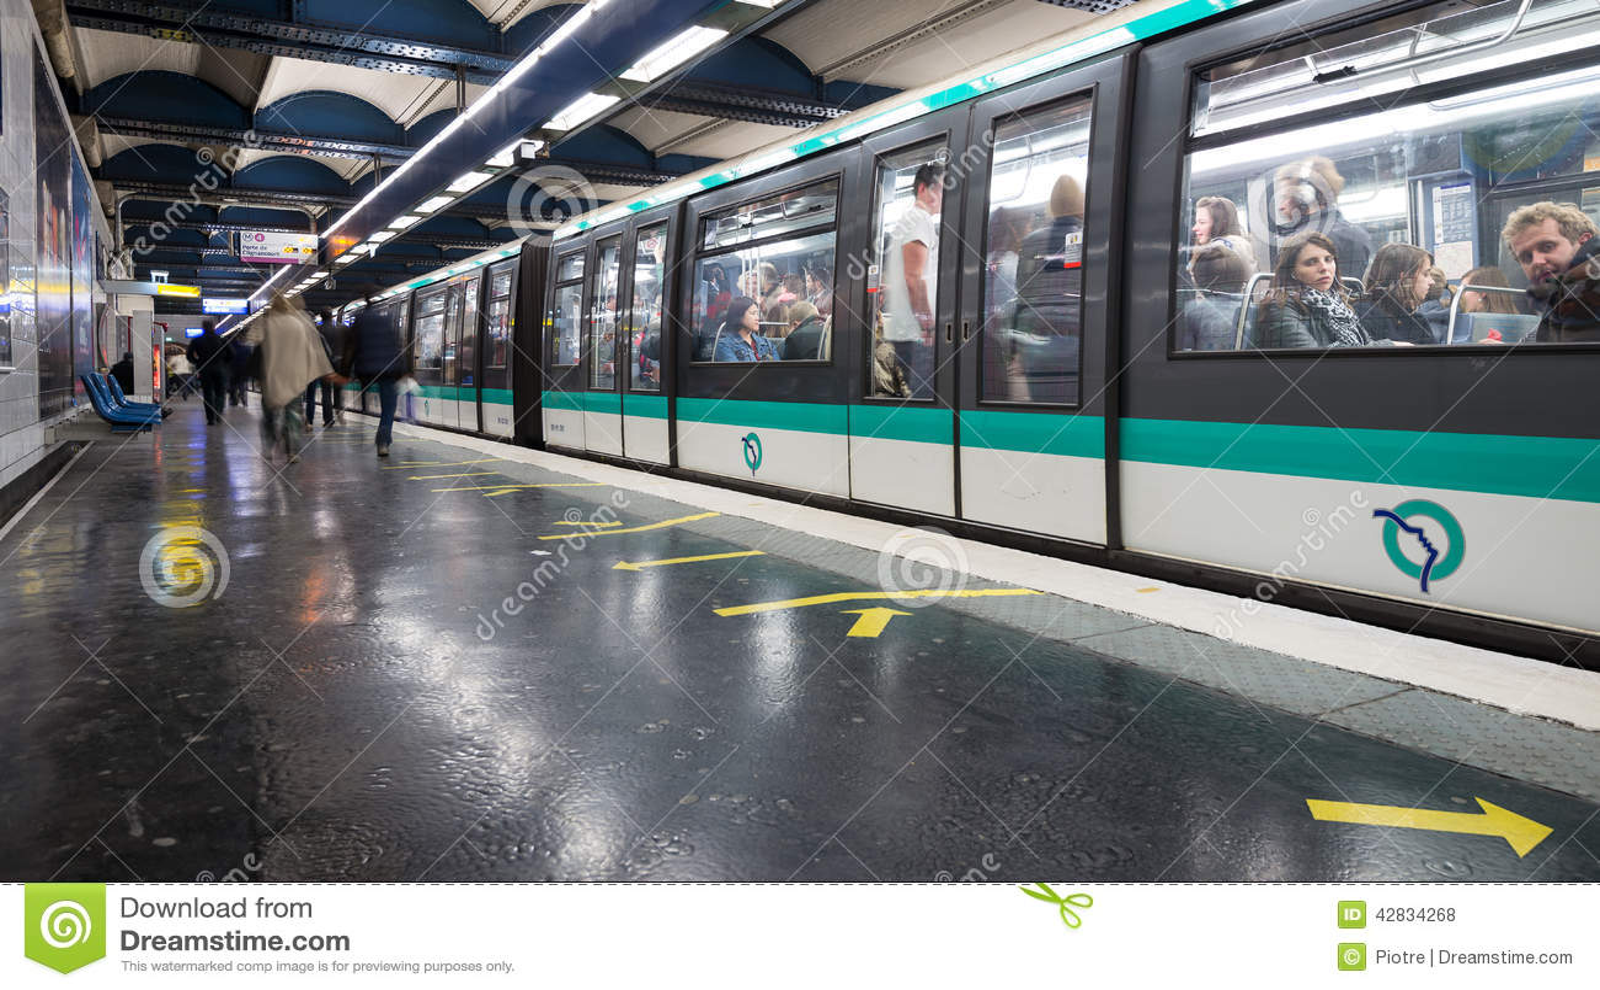 Strasbourg saint denis metro statition editorial stock - Lidl strasbourg saint denis ...